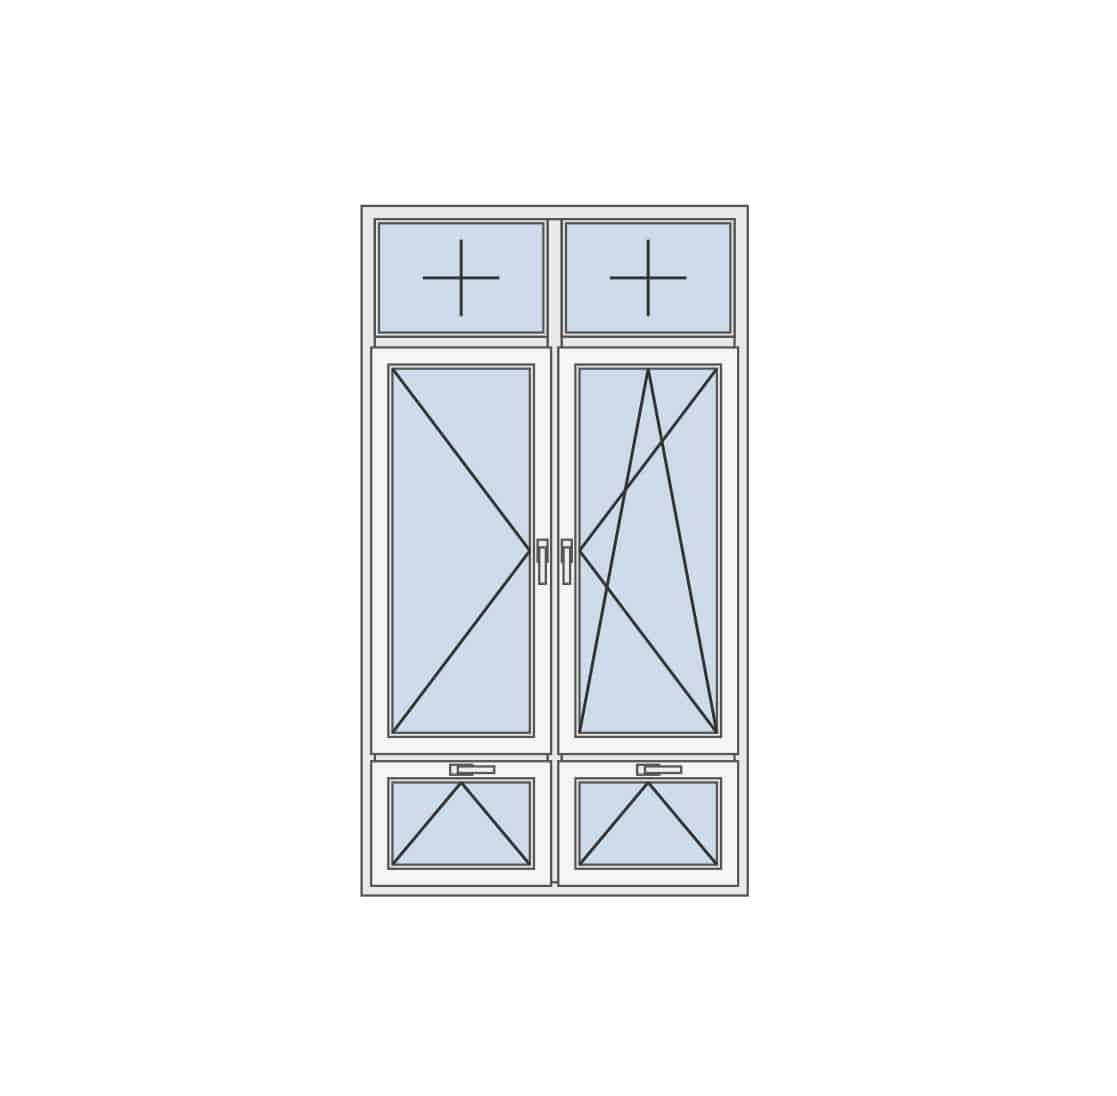 Dvokrilni prozor as kombinacijom